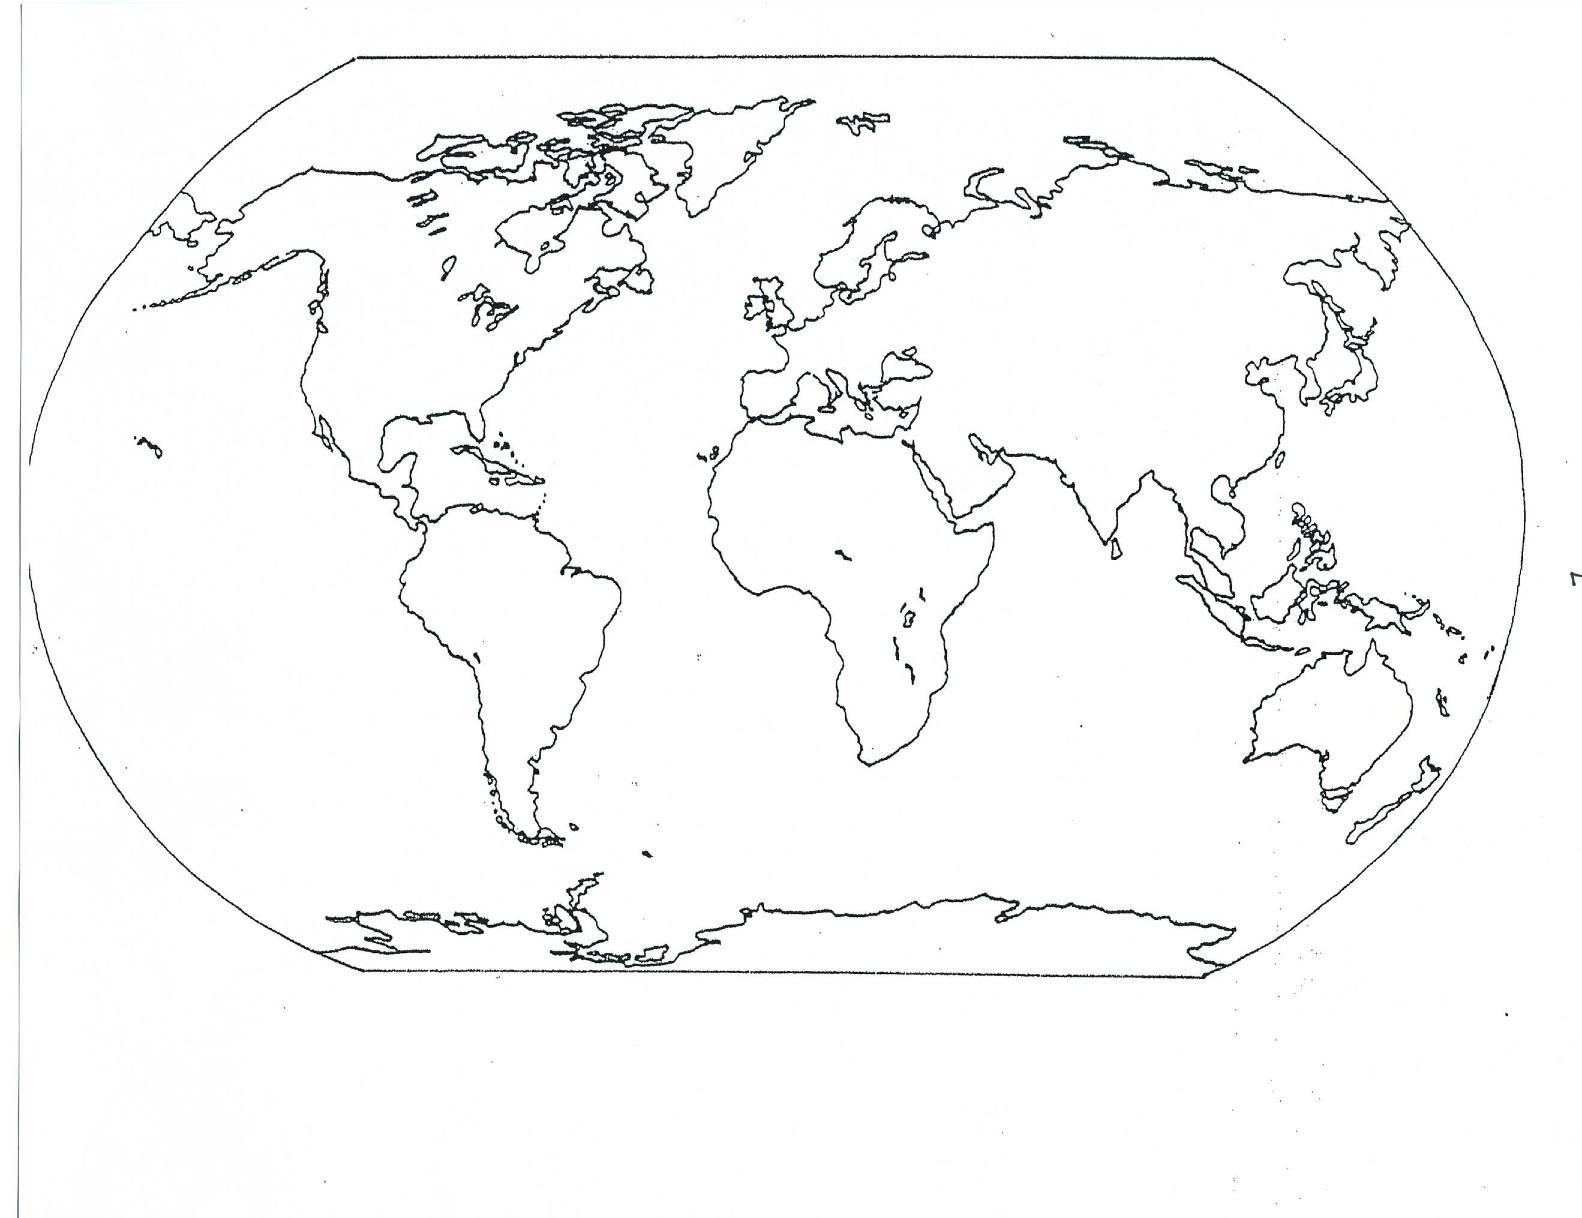 Image of: Blank World Map